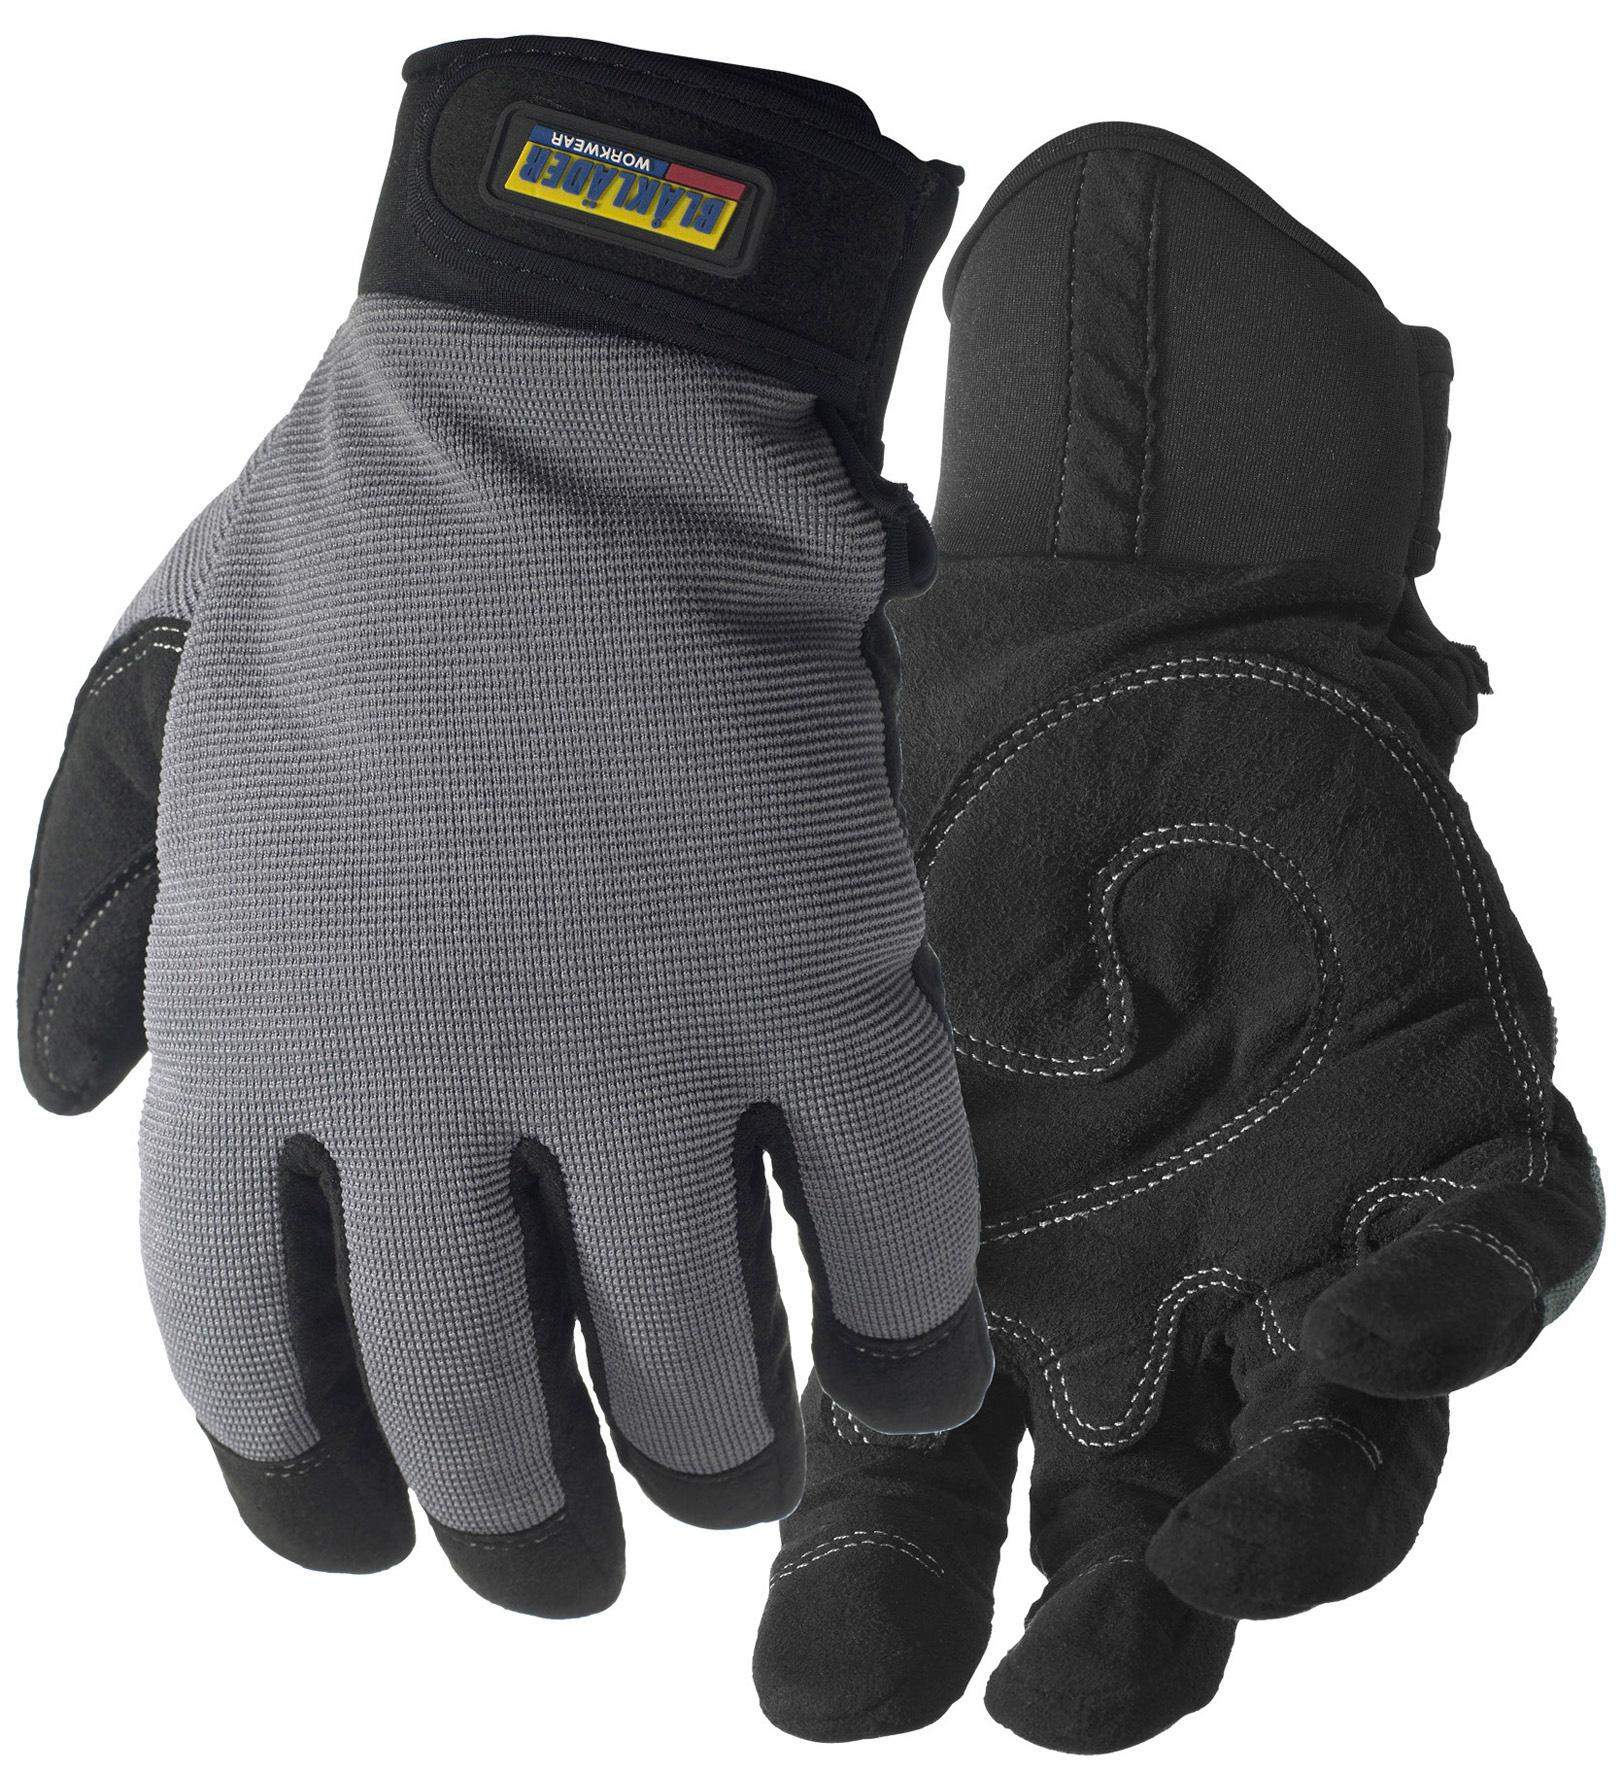 gants de travail cuir gants de protection v tements et epi distriartisan. Black Bedroom Furniture Sets. Home Design Ideas